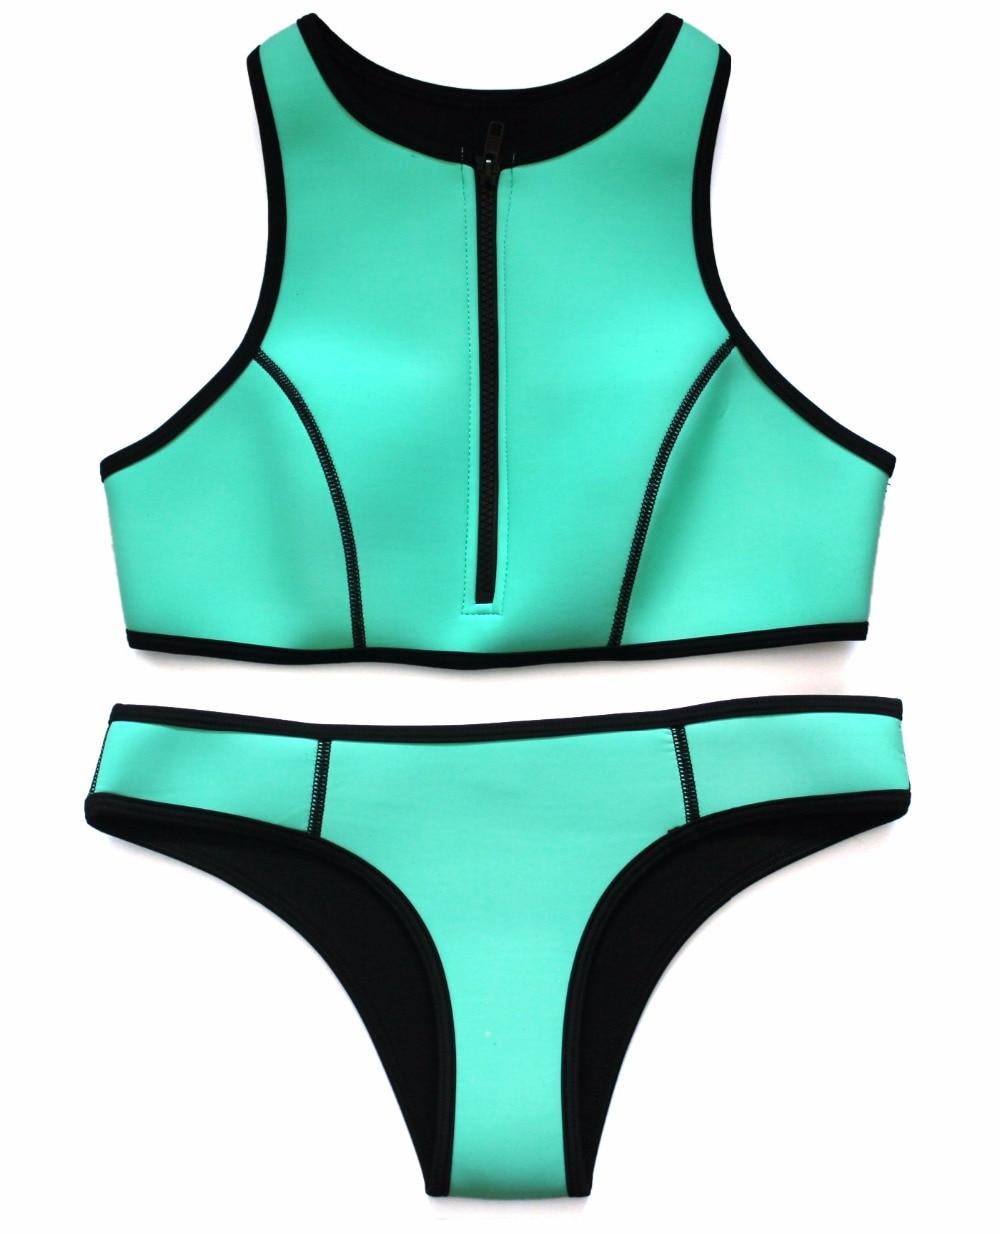 high quality green zipper sexy triangle neoprene bikini 2016 sports crop top swimwear women. Black Bedroom Furniture Sets. Home Design Ideas